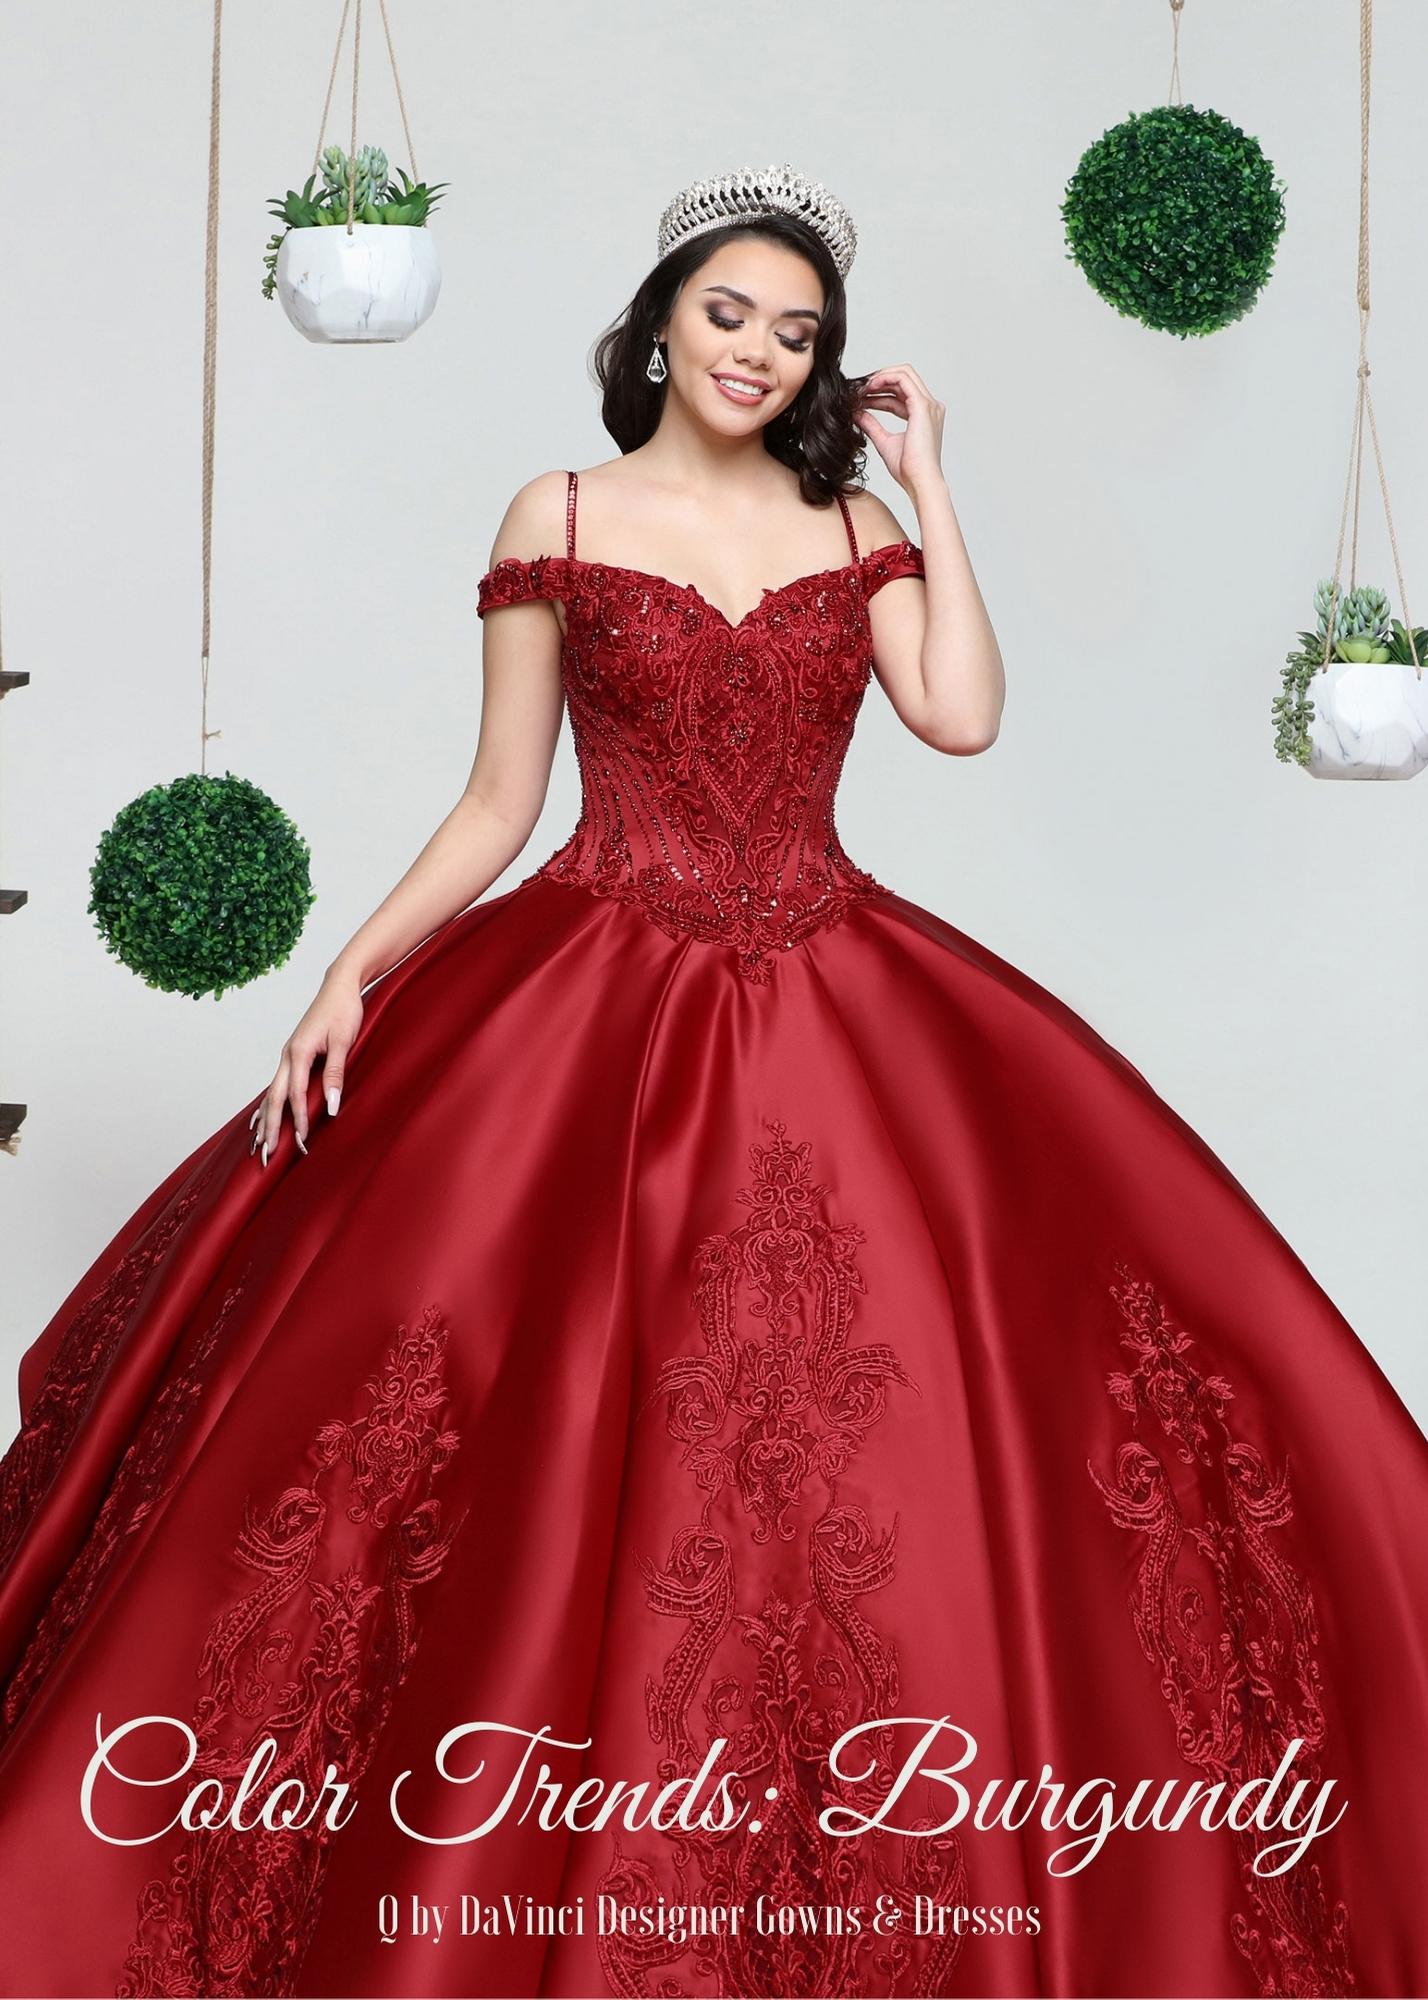 Quinceanera Dress Color Trends: Burgundy